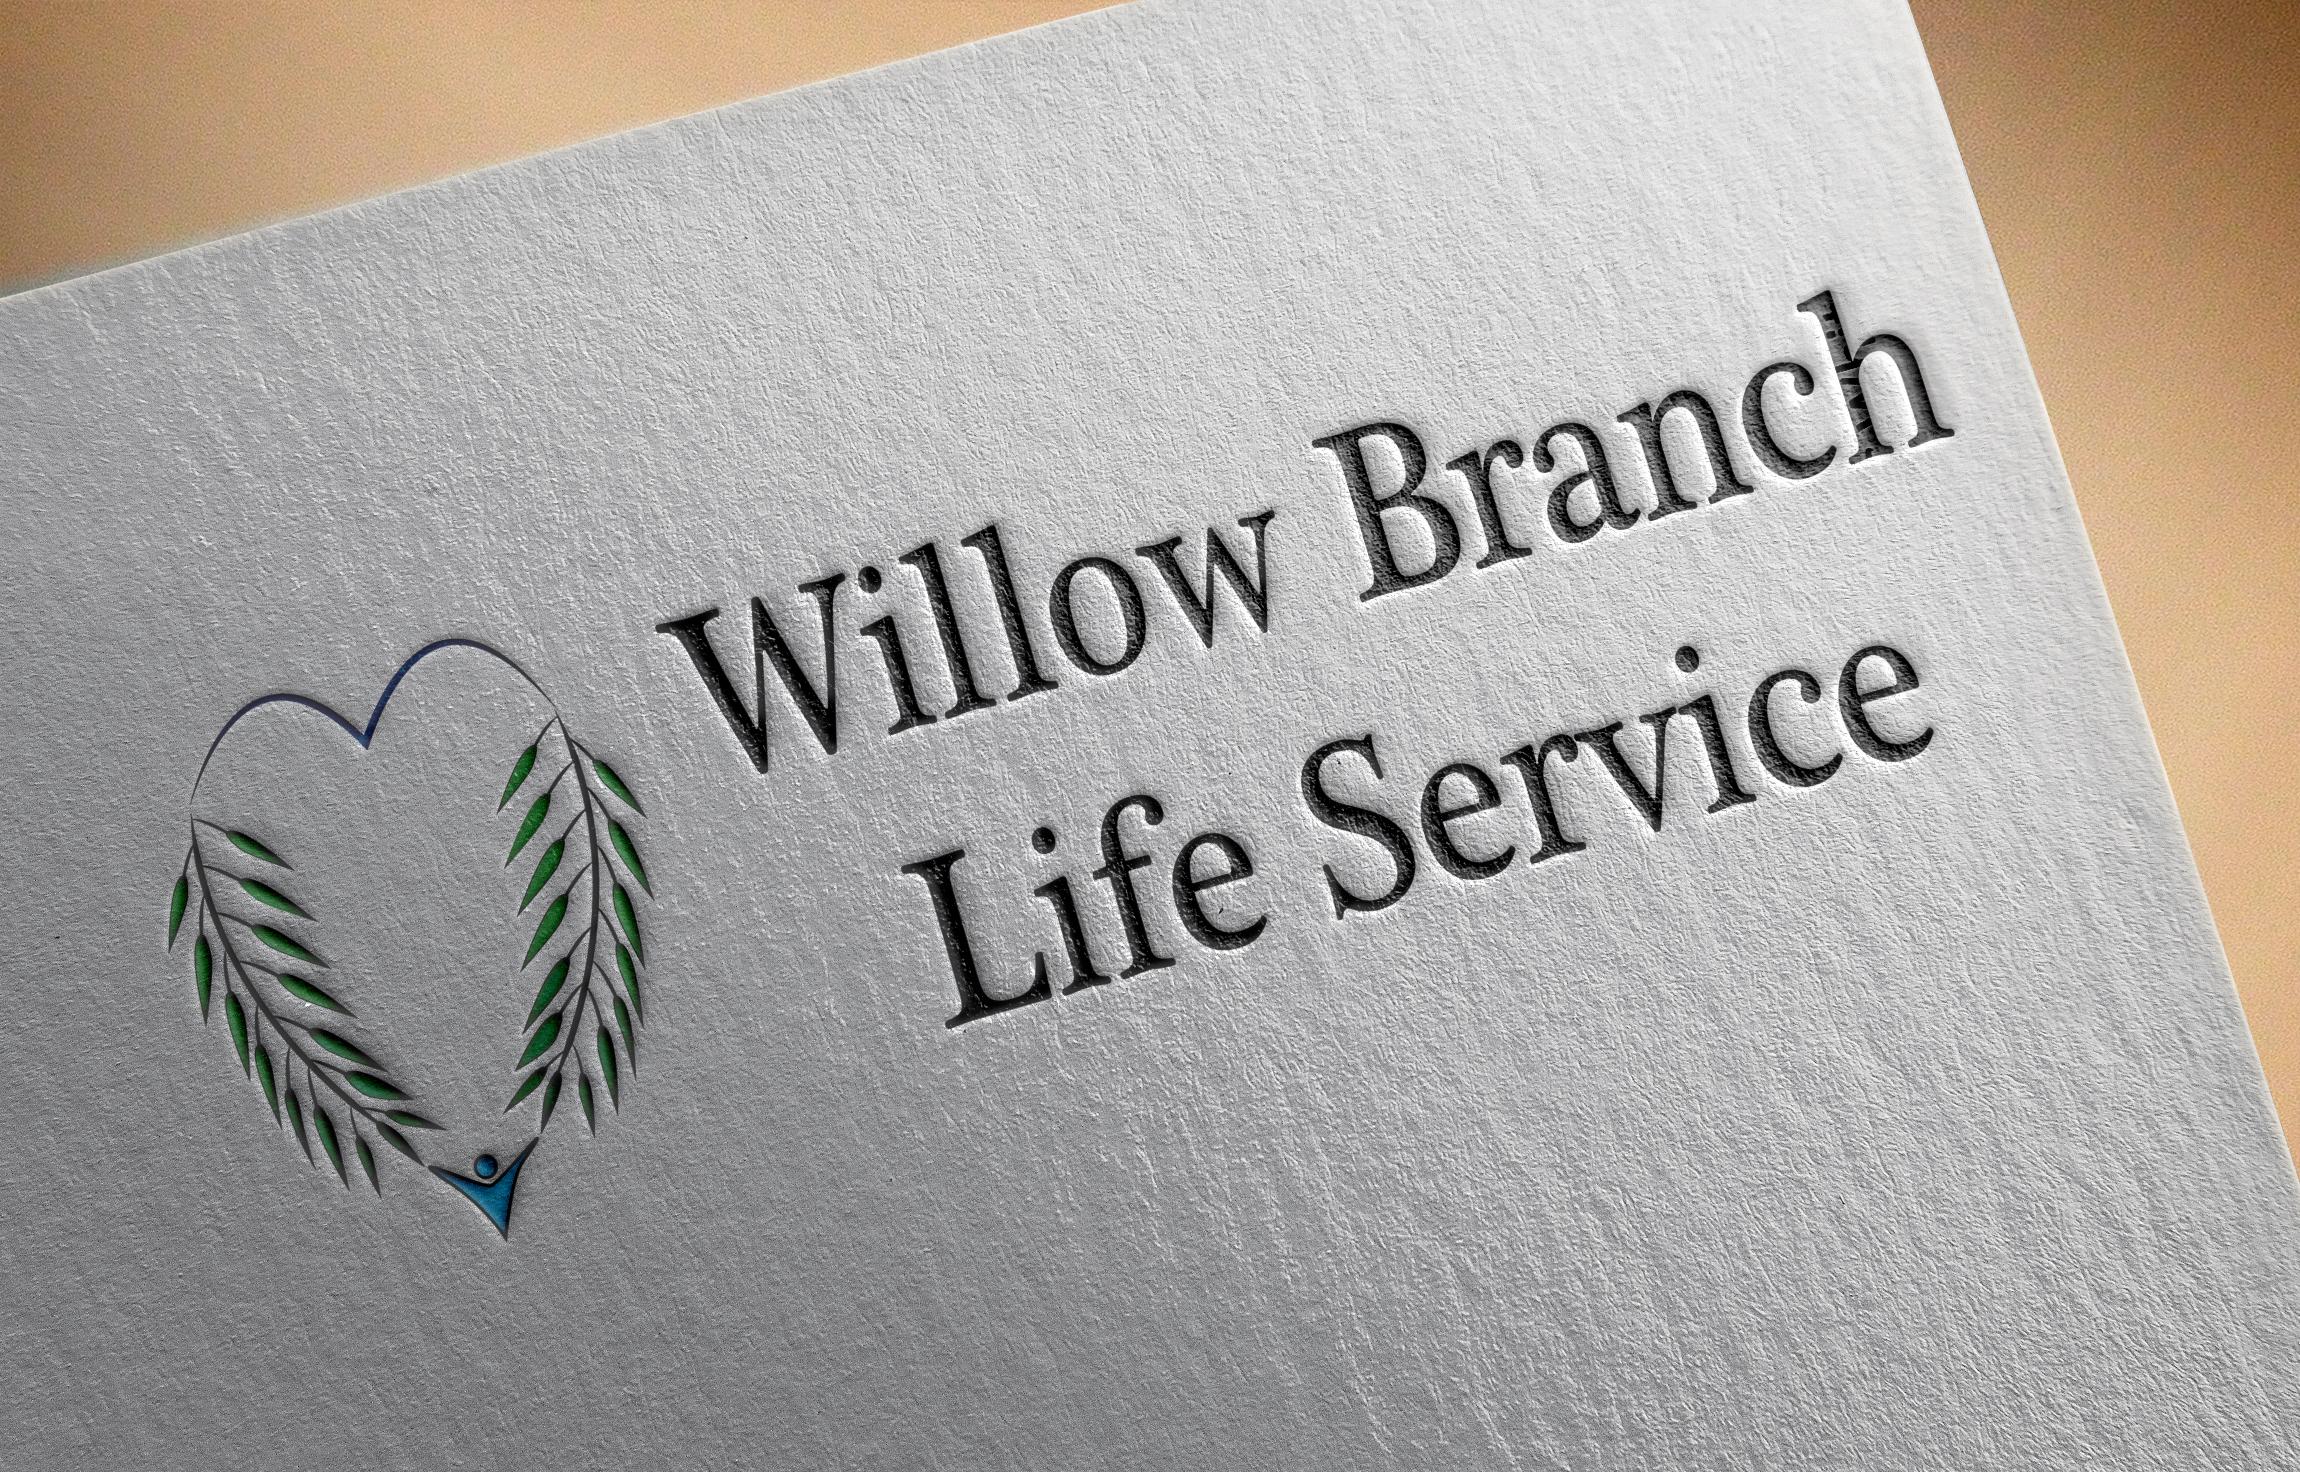 Logo Design by Goran Ledjenovic - Entry No. 8 in the Logo Design Contest Artistic Logo Design for Willow Branch Life Service.